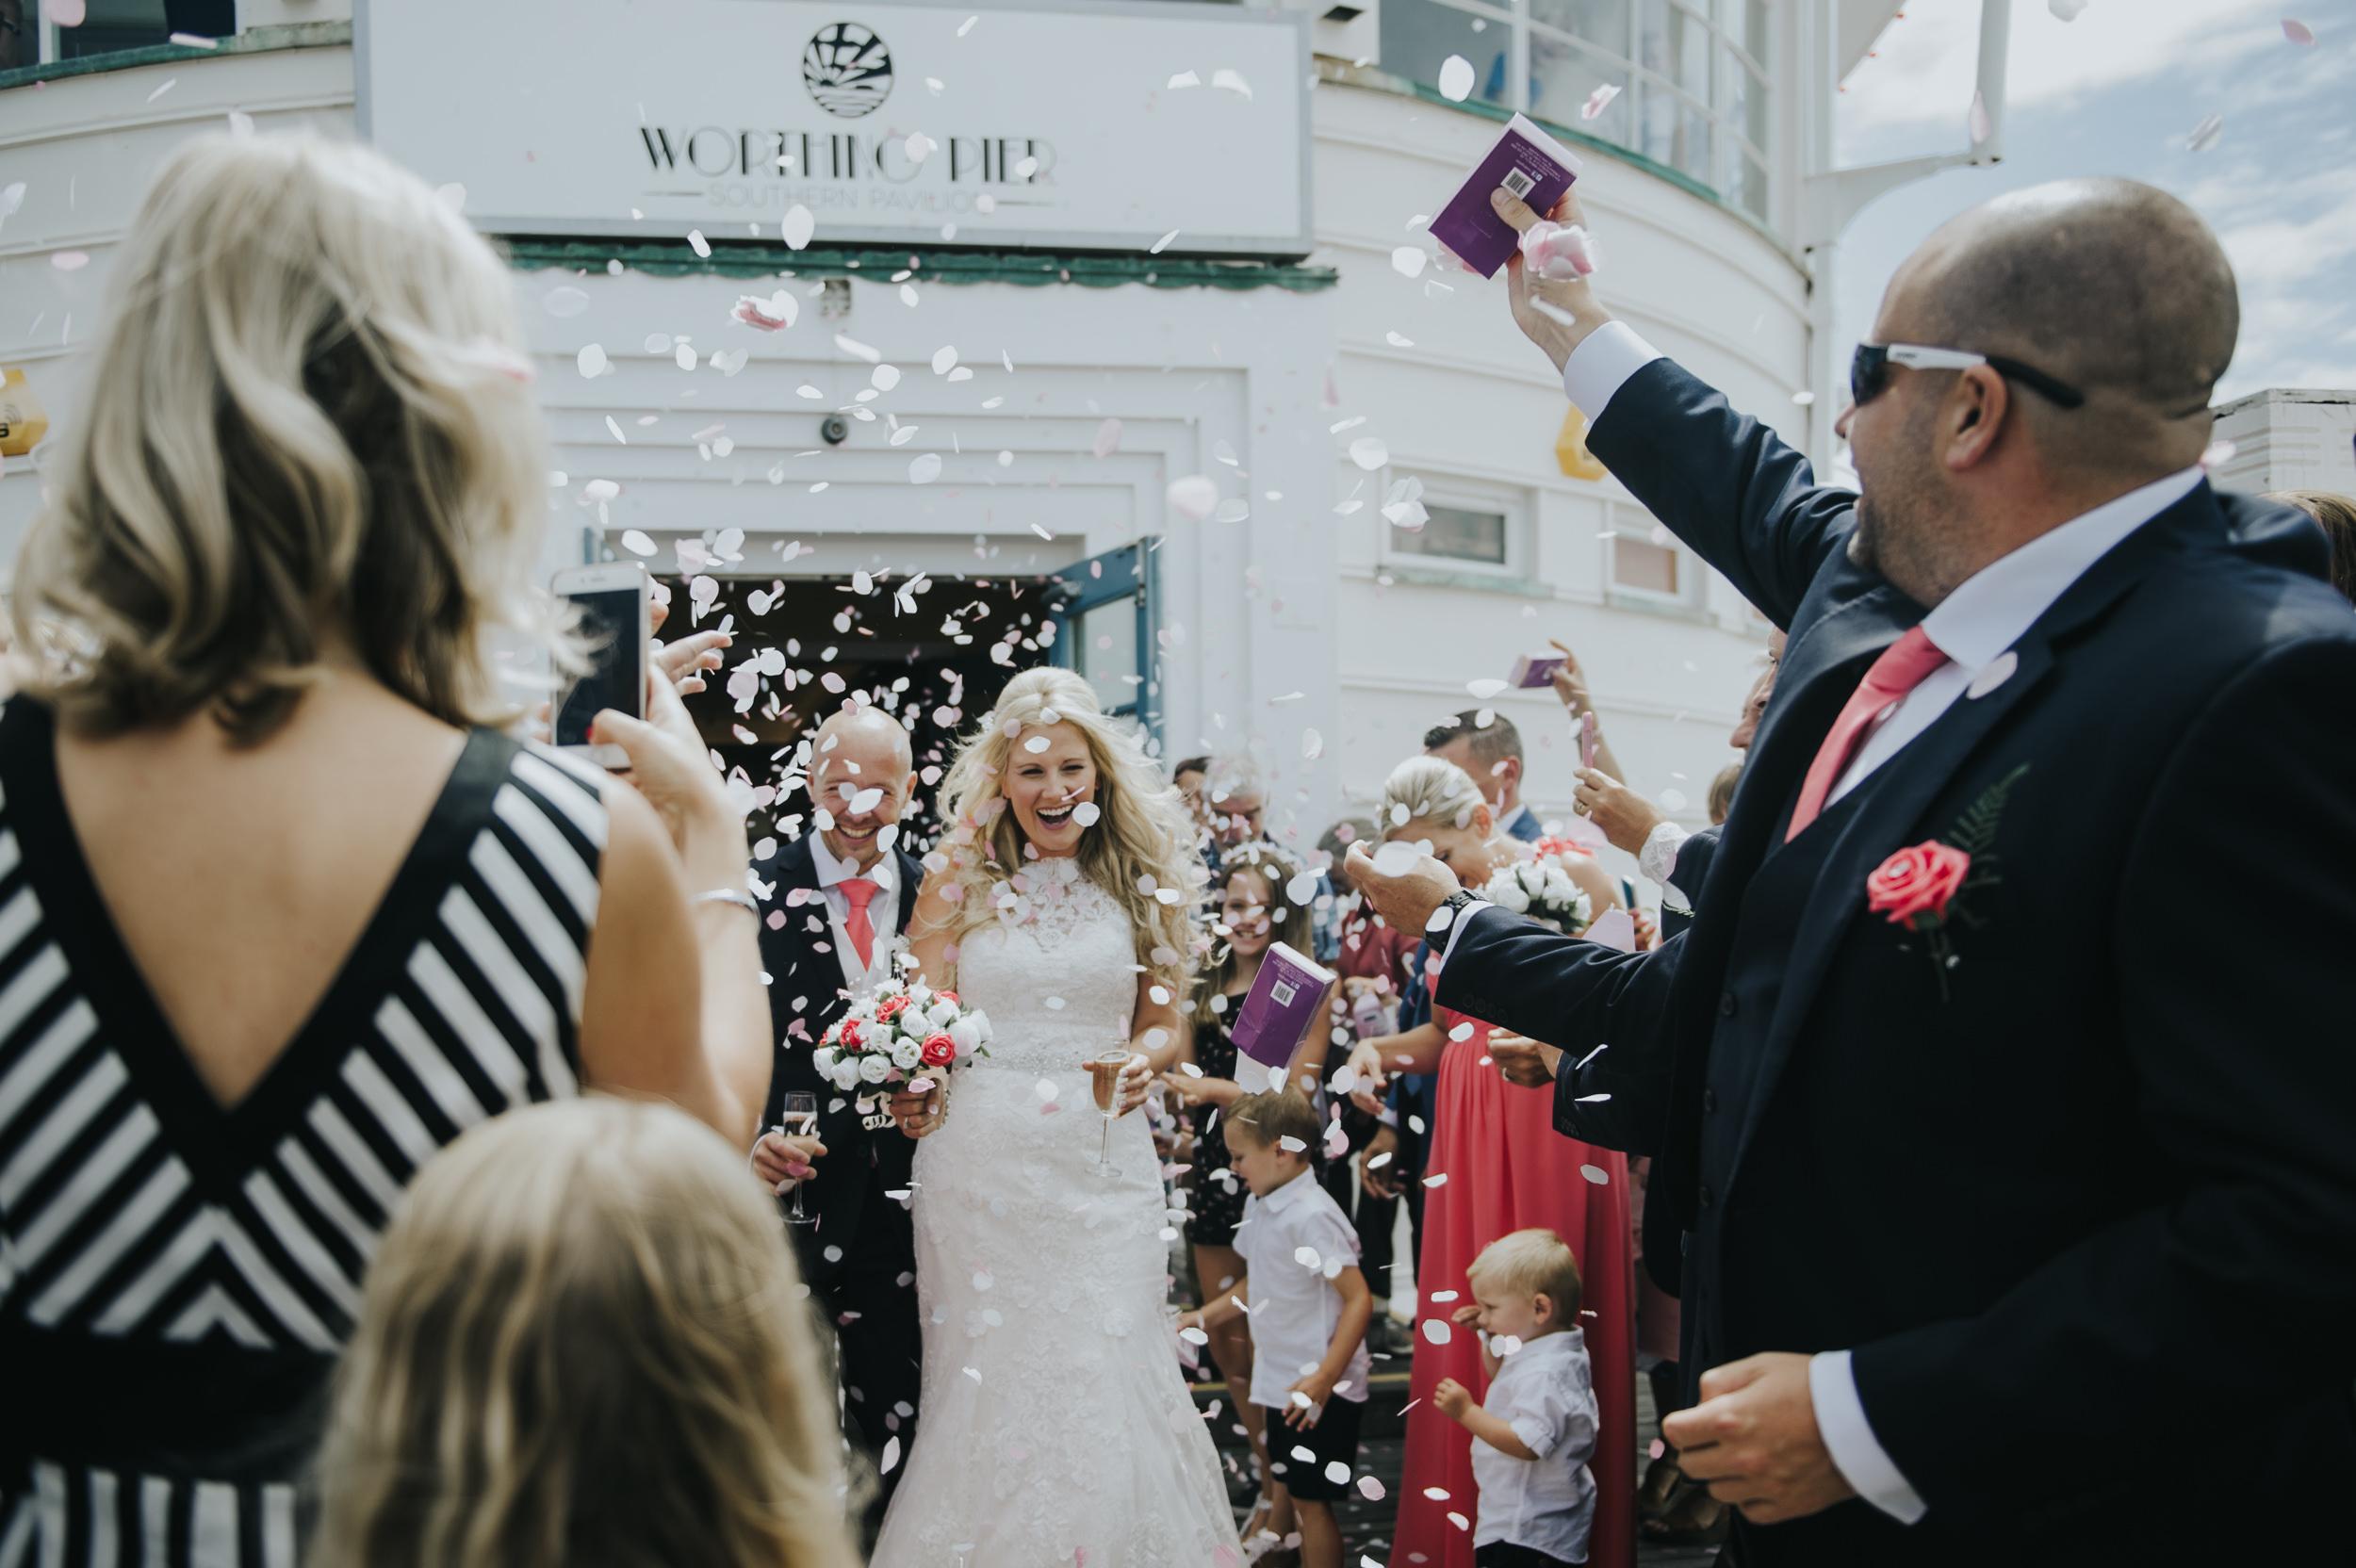 worthing-pier-wedding-004.JPG